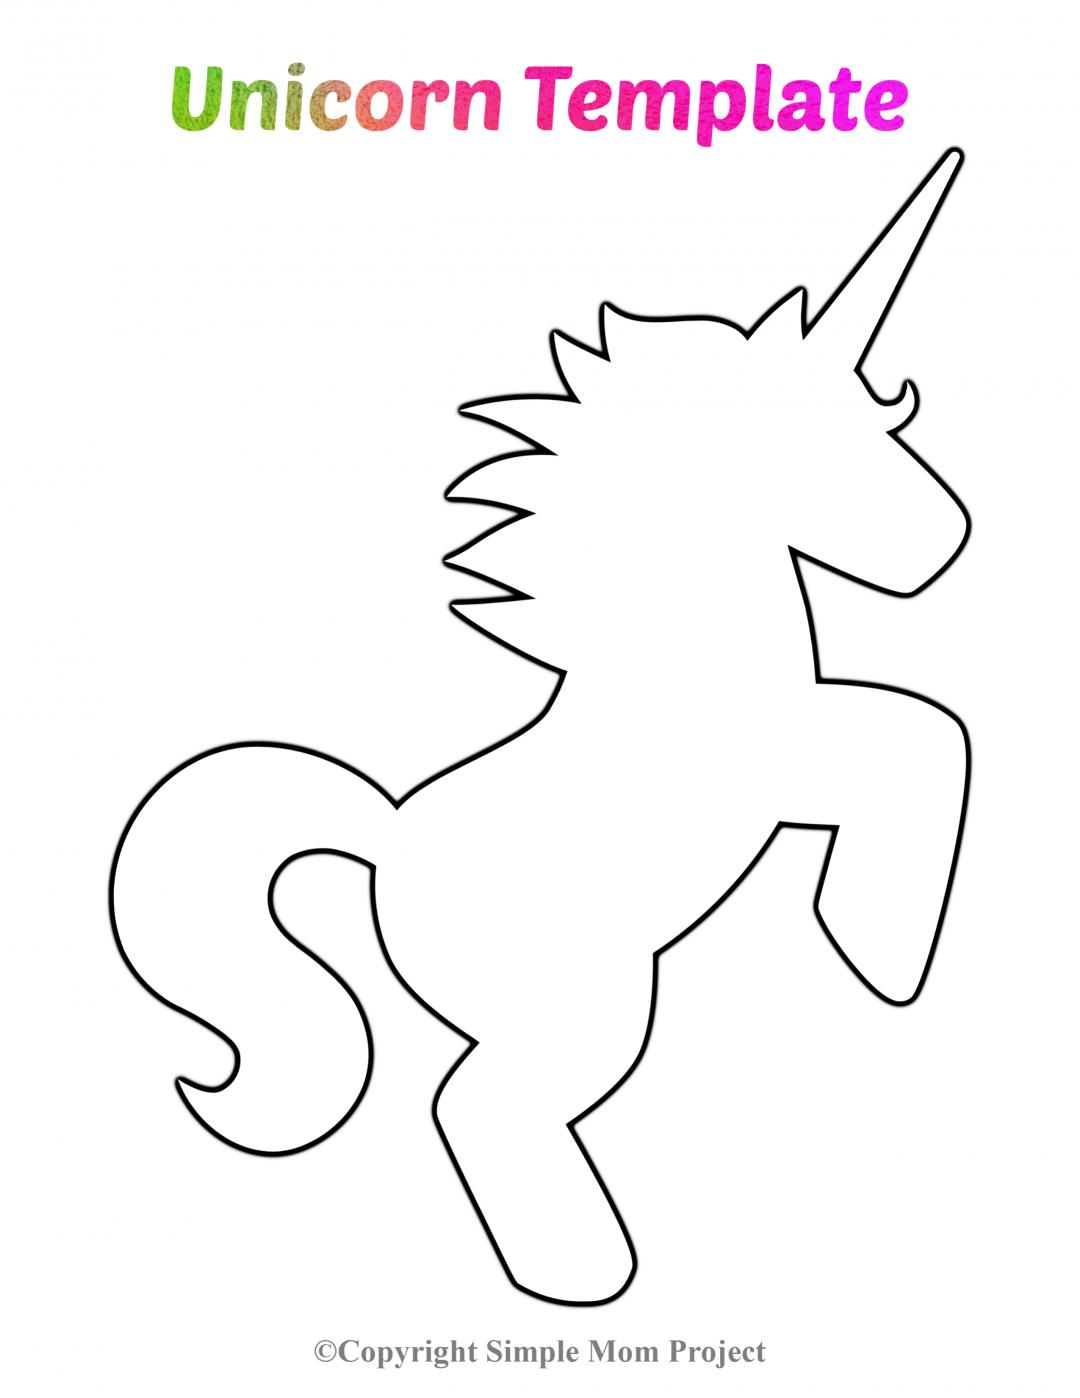 Use This Free Printable Unicorn Template Sihouette For Any Of Your Unicorn Crafts It Is Great For Diy Projects C Aplike Sablonlari Tekboynuz Boyama Sayfalari